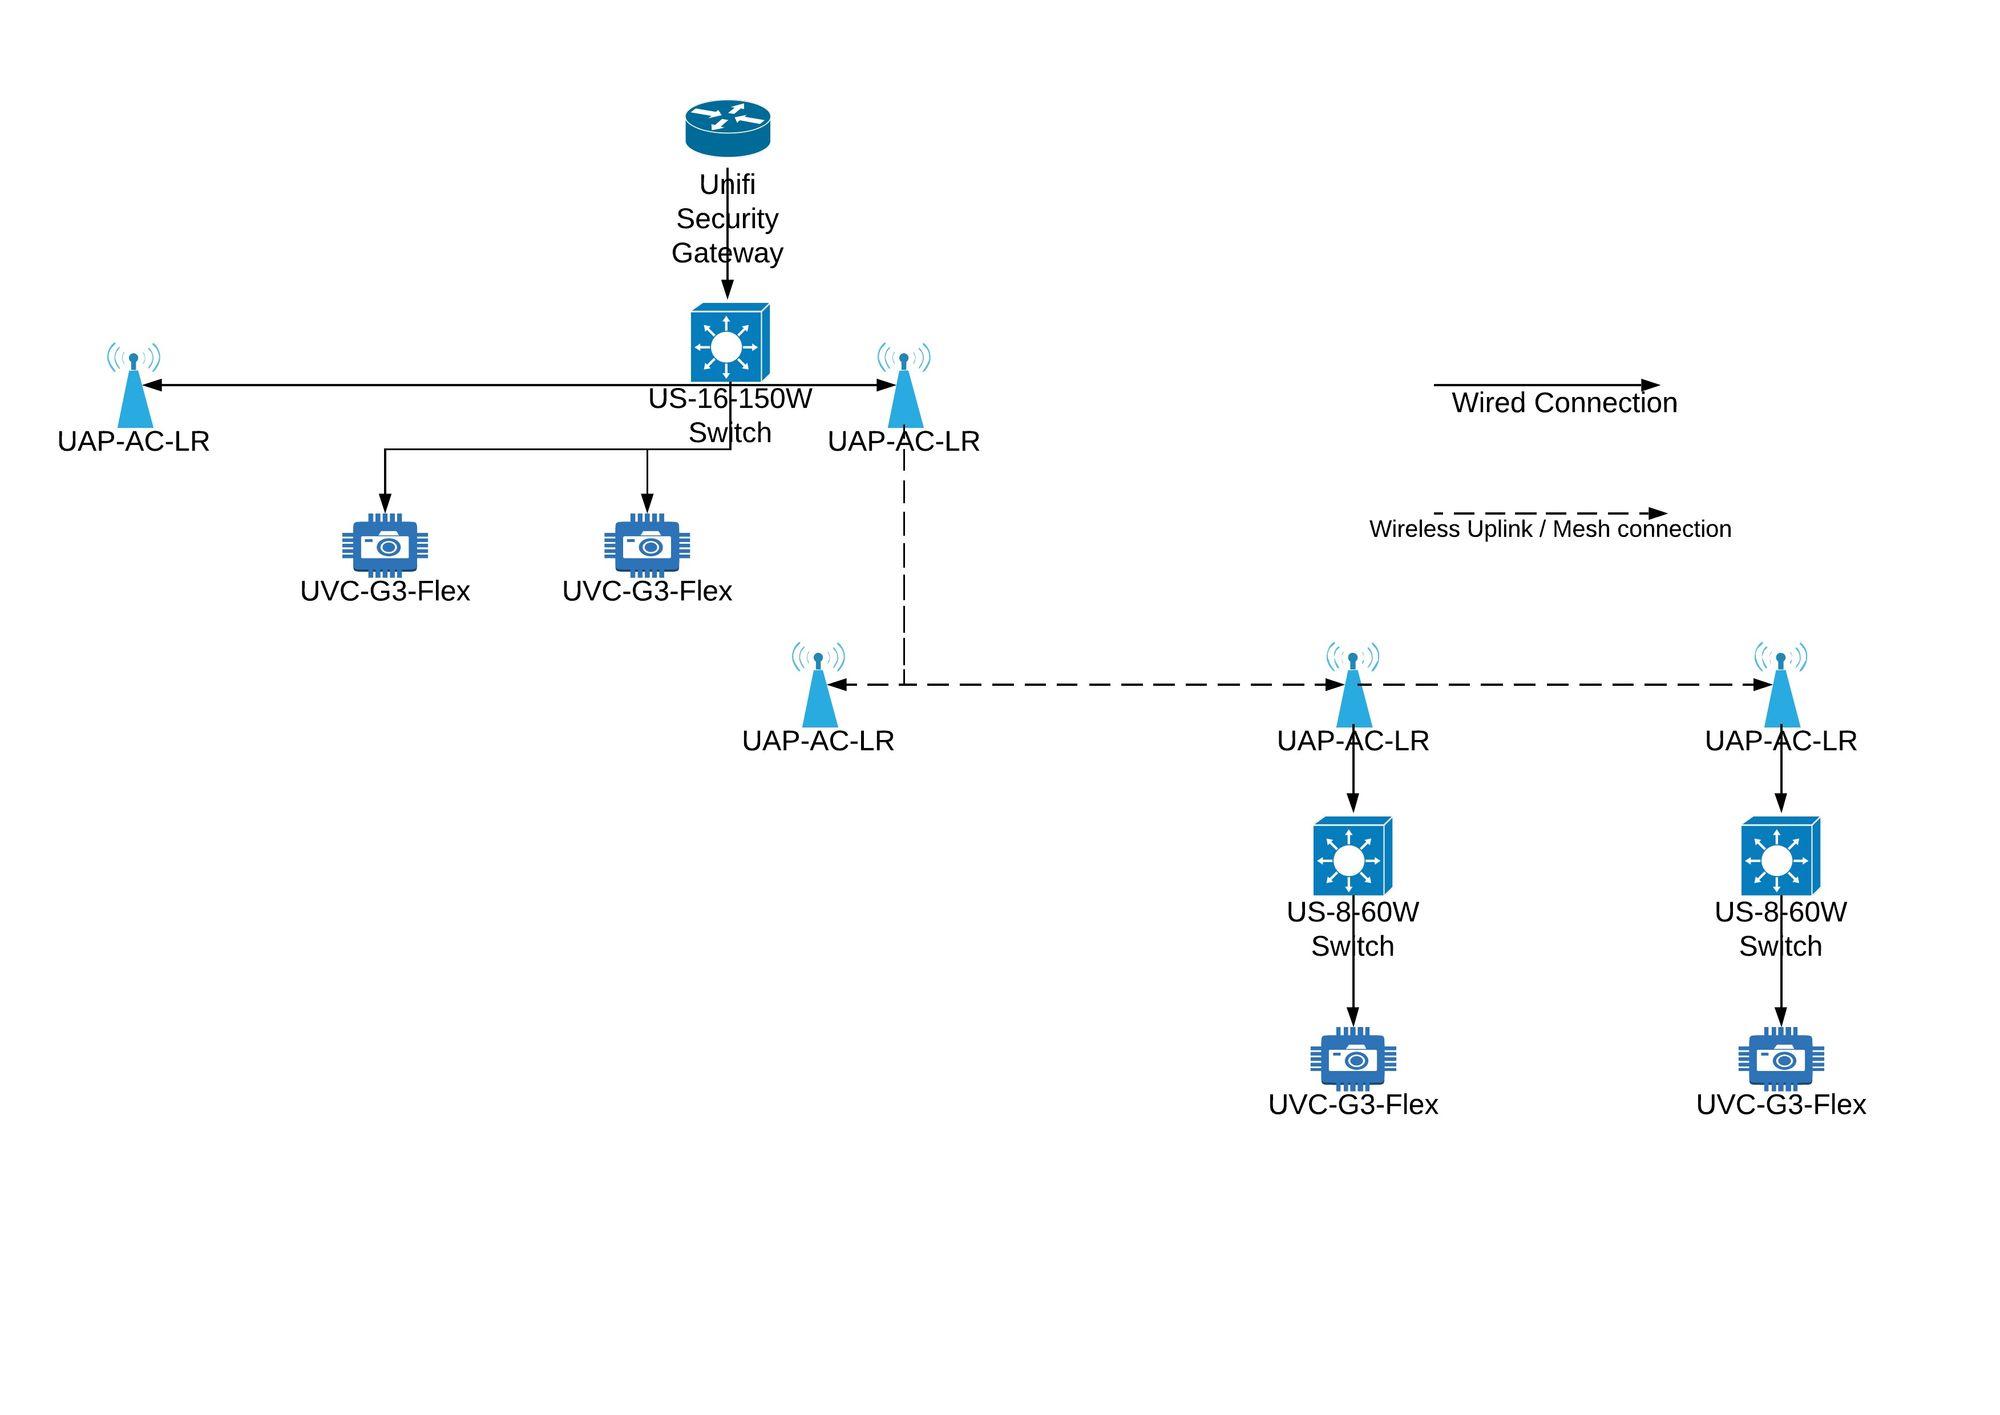 ubiquiti wiring diagram unifi wireless uplink wireless mesh topology question ubiquiti  unifi wireless uplink wireless mesh